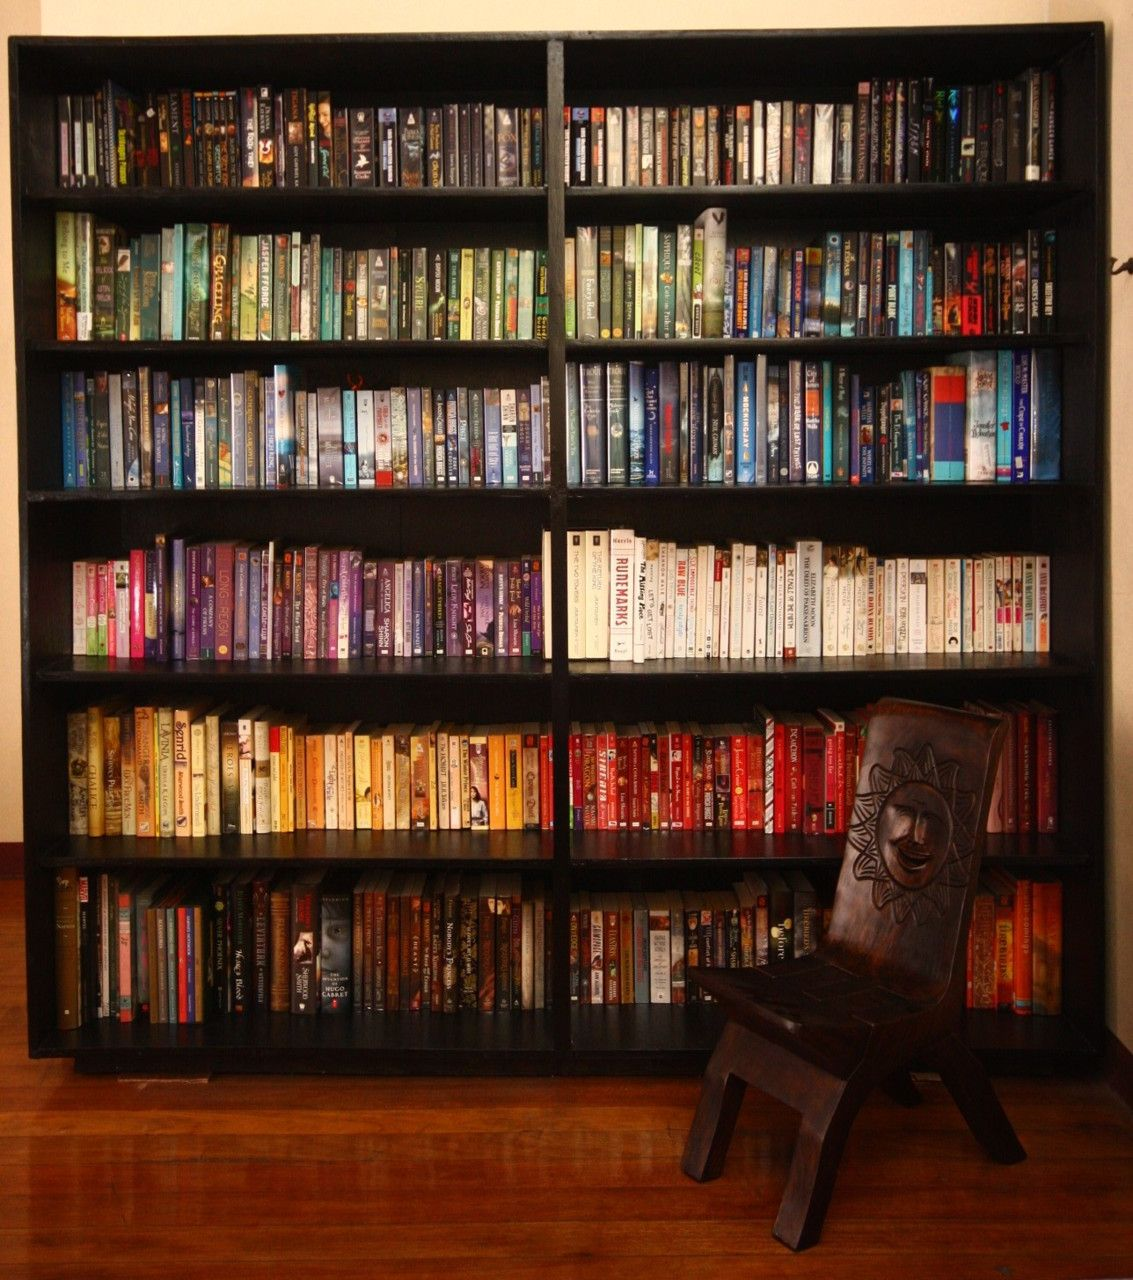 Co colour coordinated bookshelf - Bookshelf Porn 3